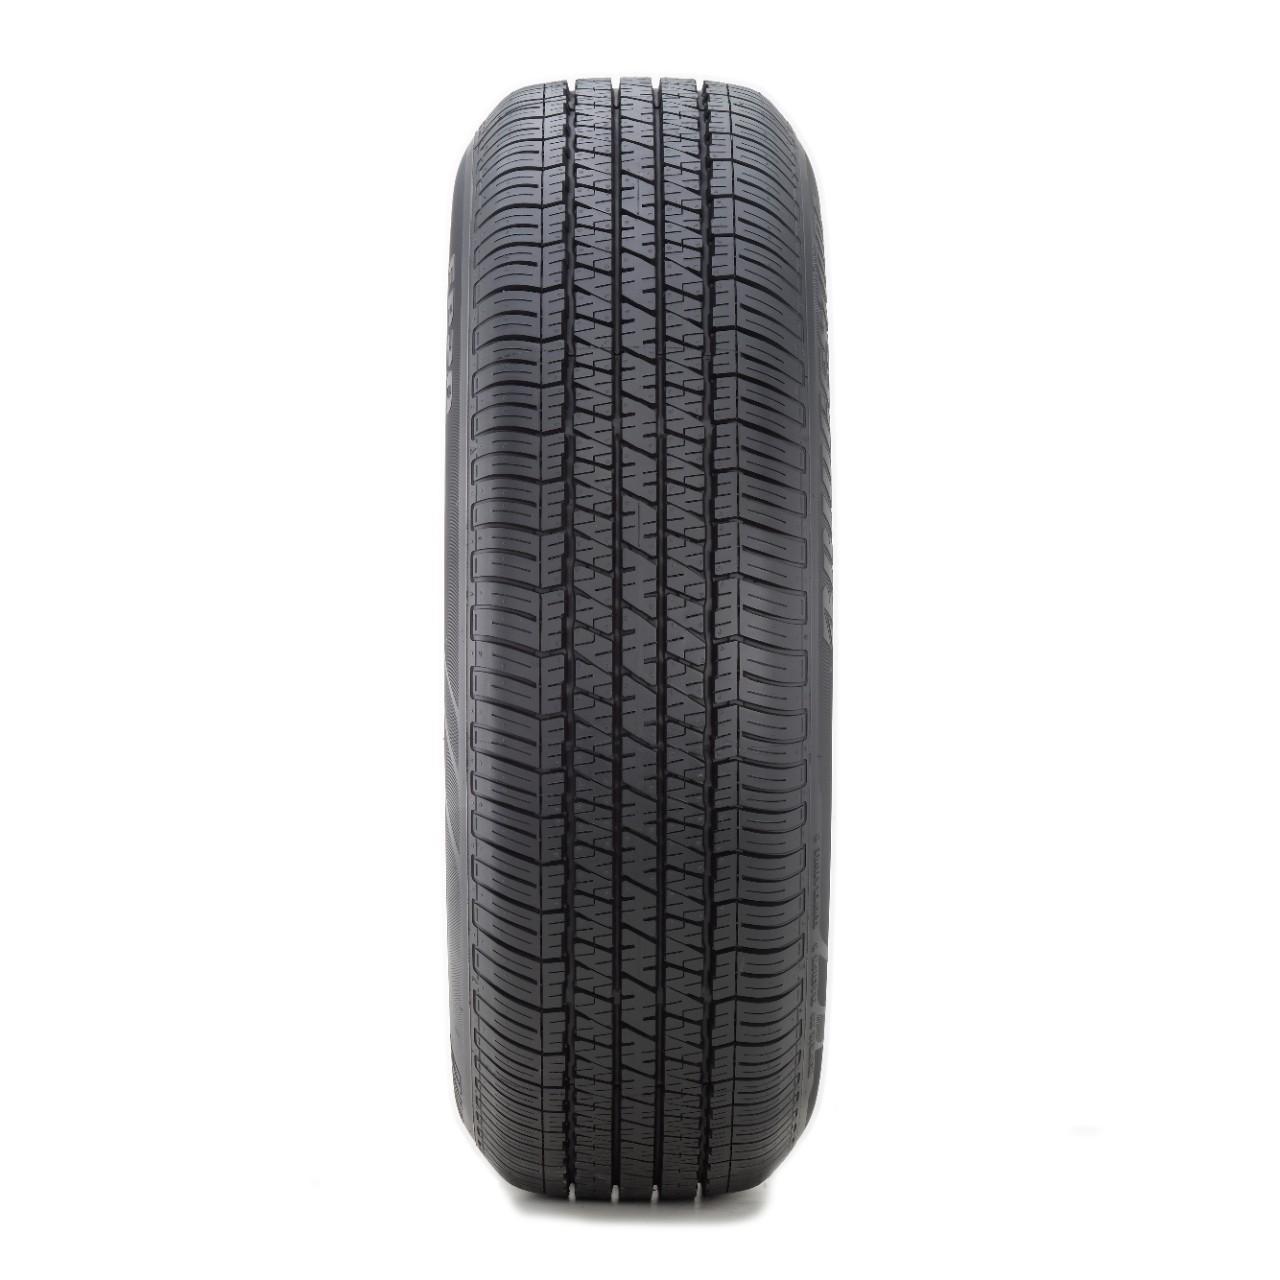 Bridgestone Tires Ecopia EP20 Passenger All Season Tire